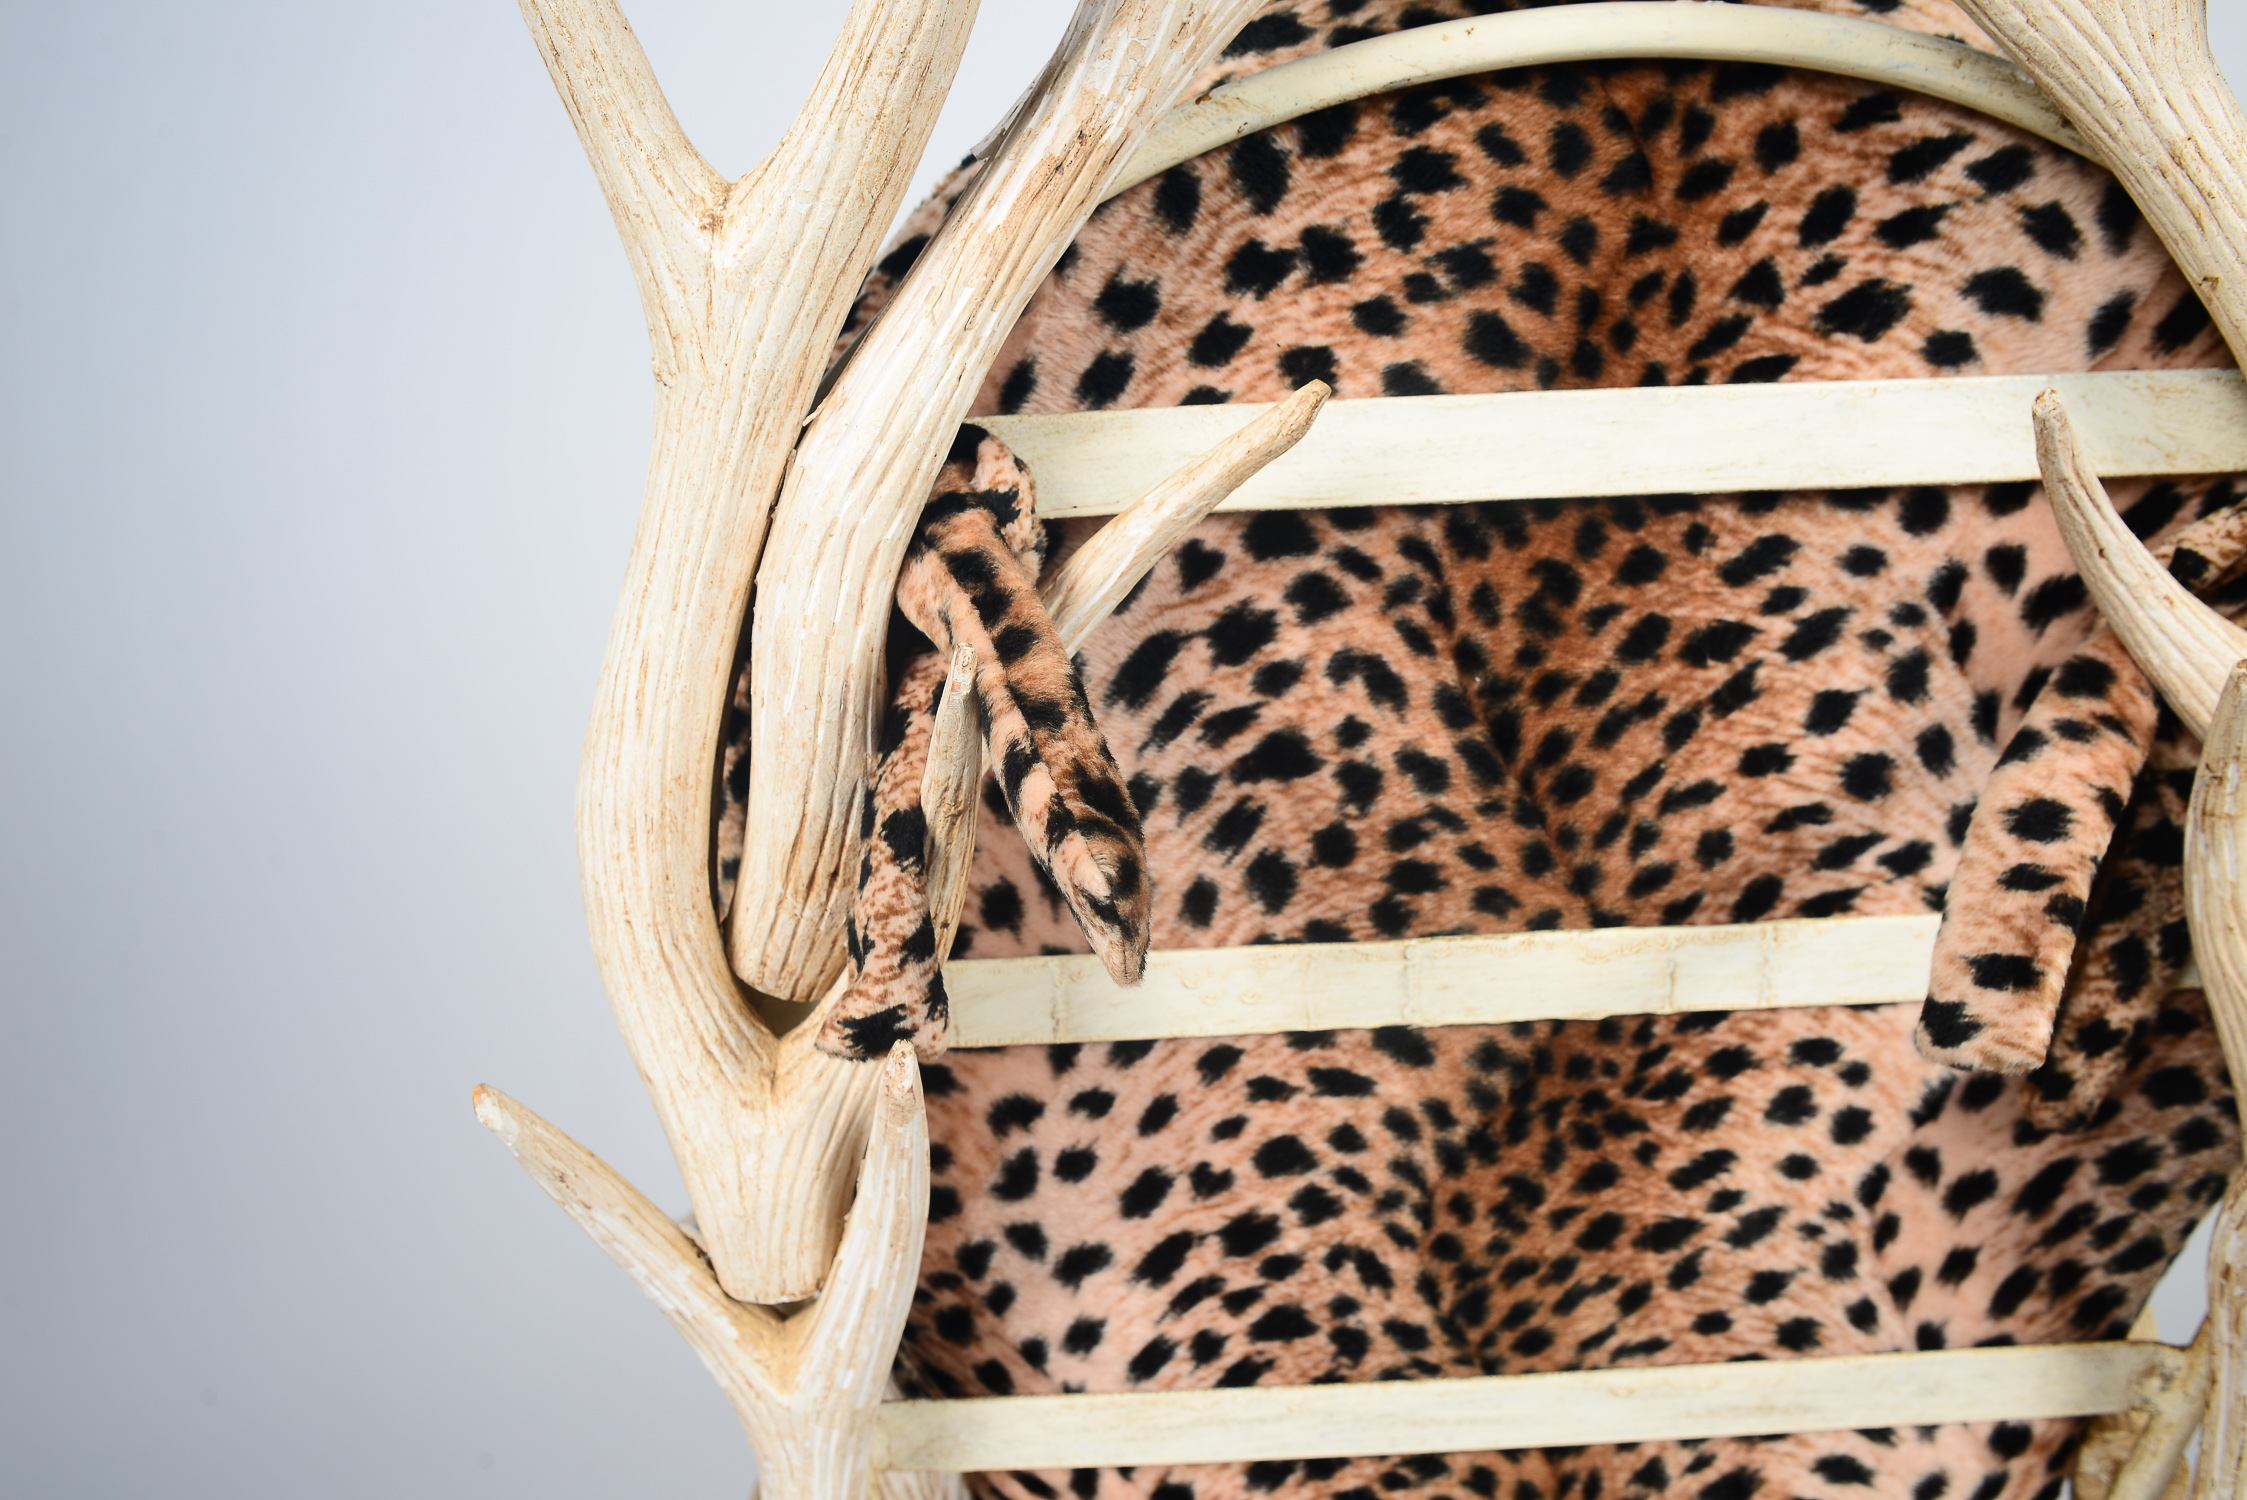 leopard high heel chair amazon xmas covers decorative print faux antler ebth